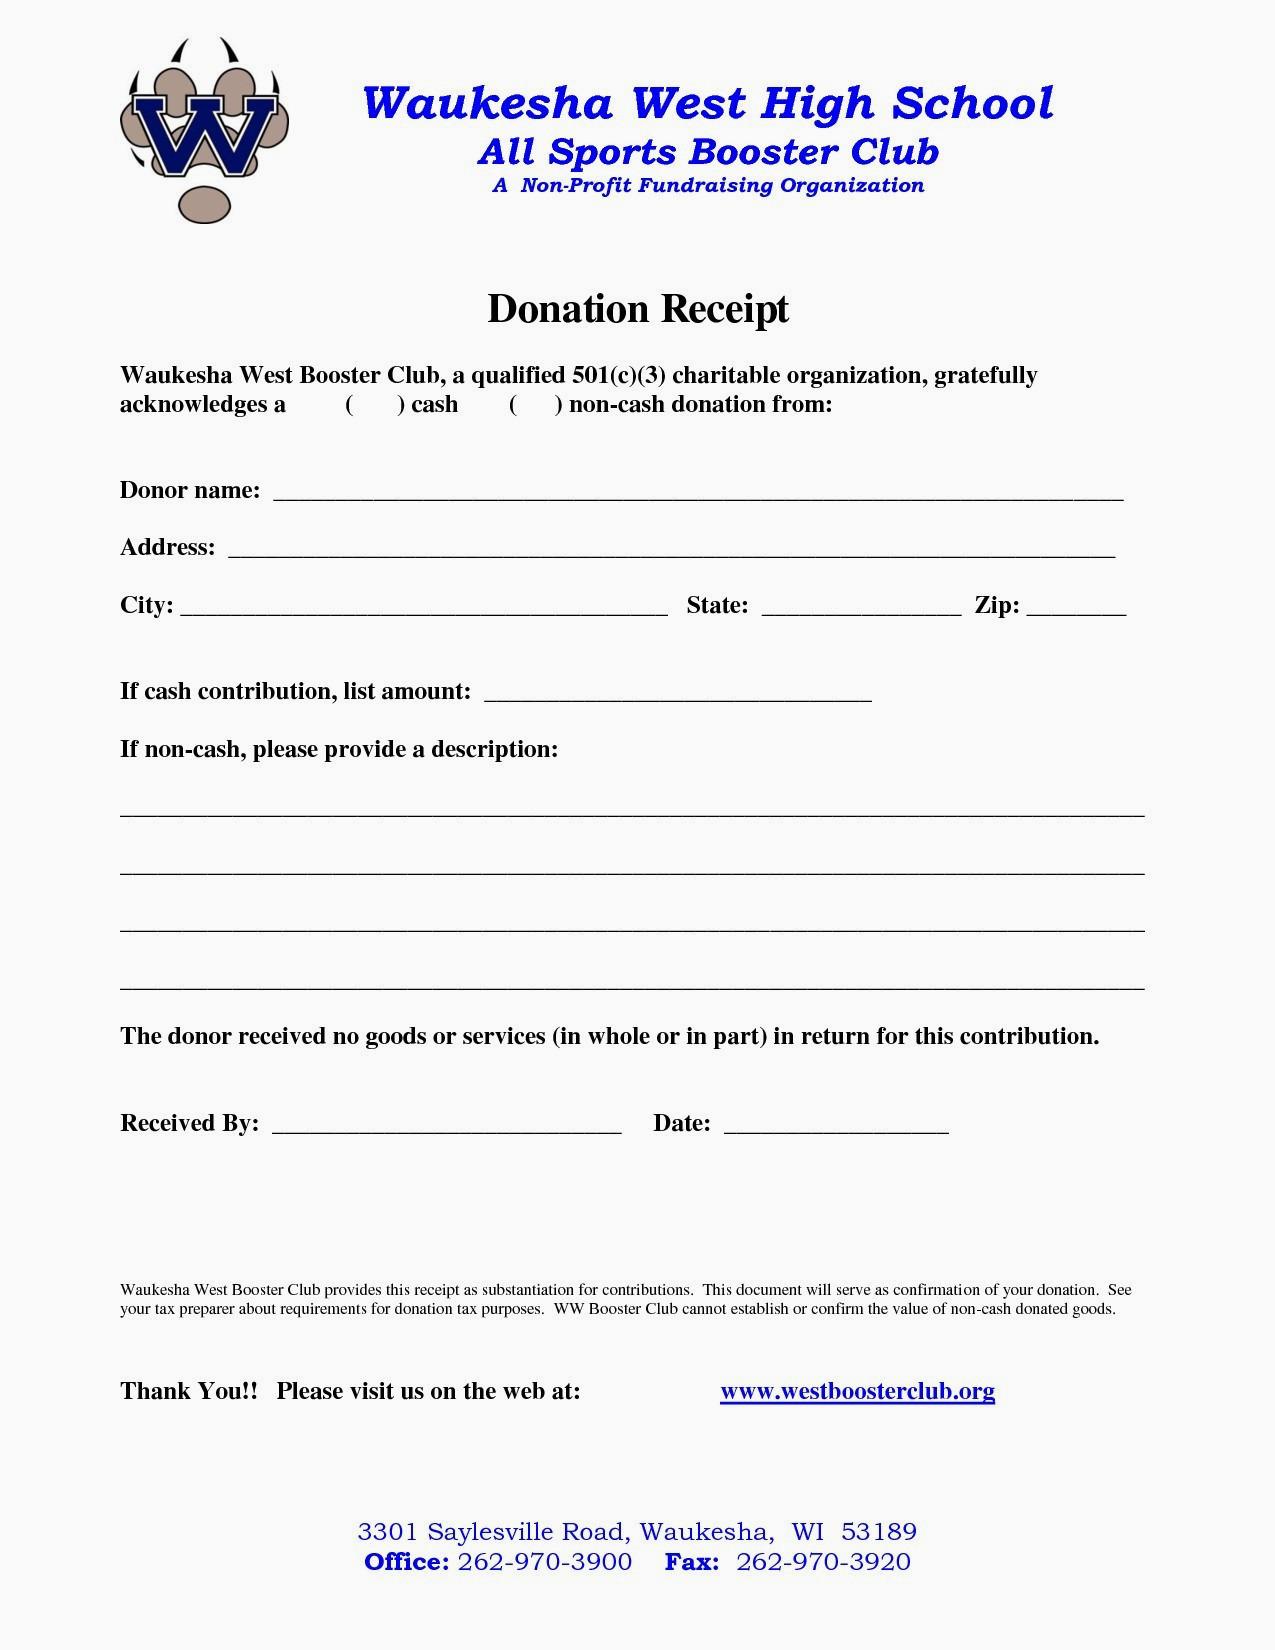 Donation Letter Template for Non Profit organization - 20 New Non Profit Customizable Receipt Template